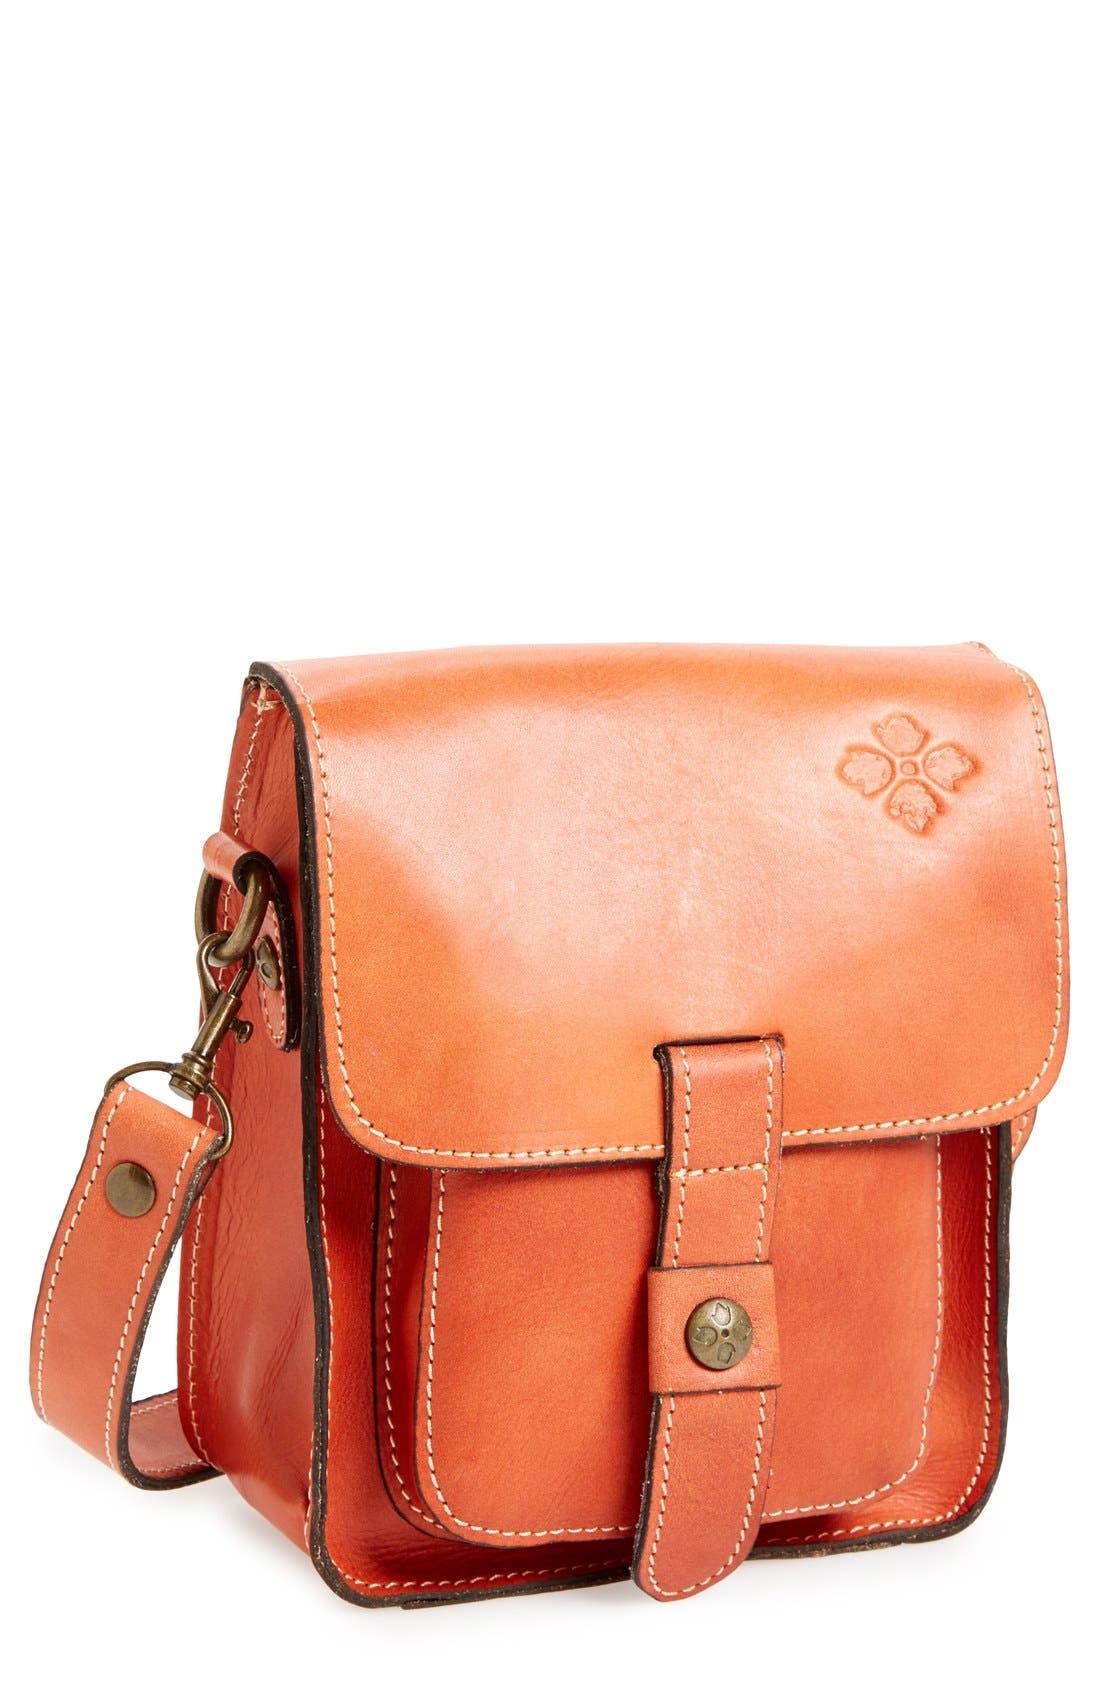 Main Image - Patricia Nash 'Lari' Leather Crossbody Bag